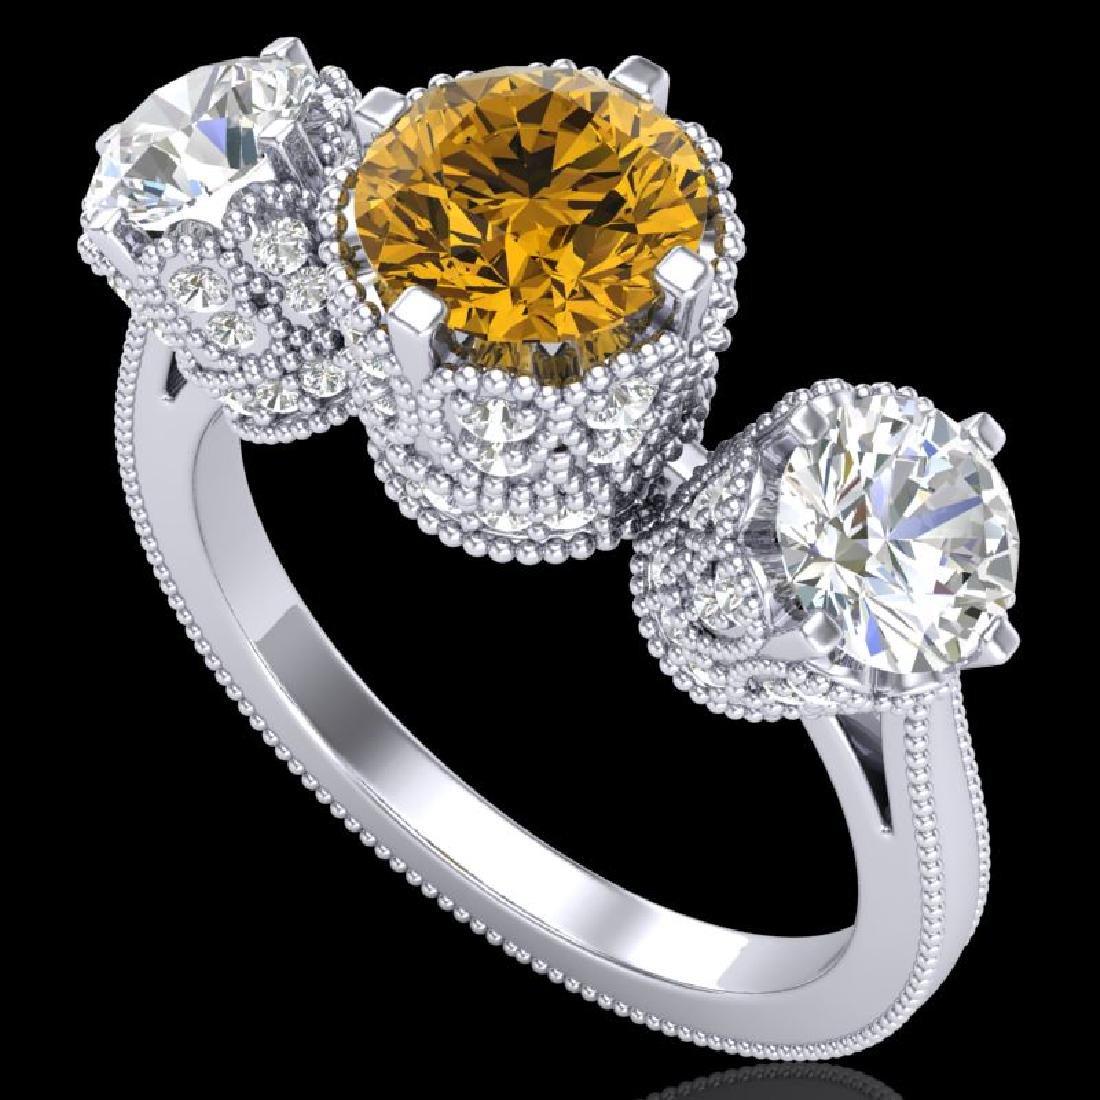 3.06 CTW Intense Fancy Yellow Diamond Art Deco 3 Stone